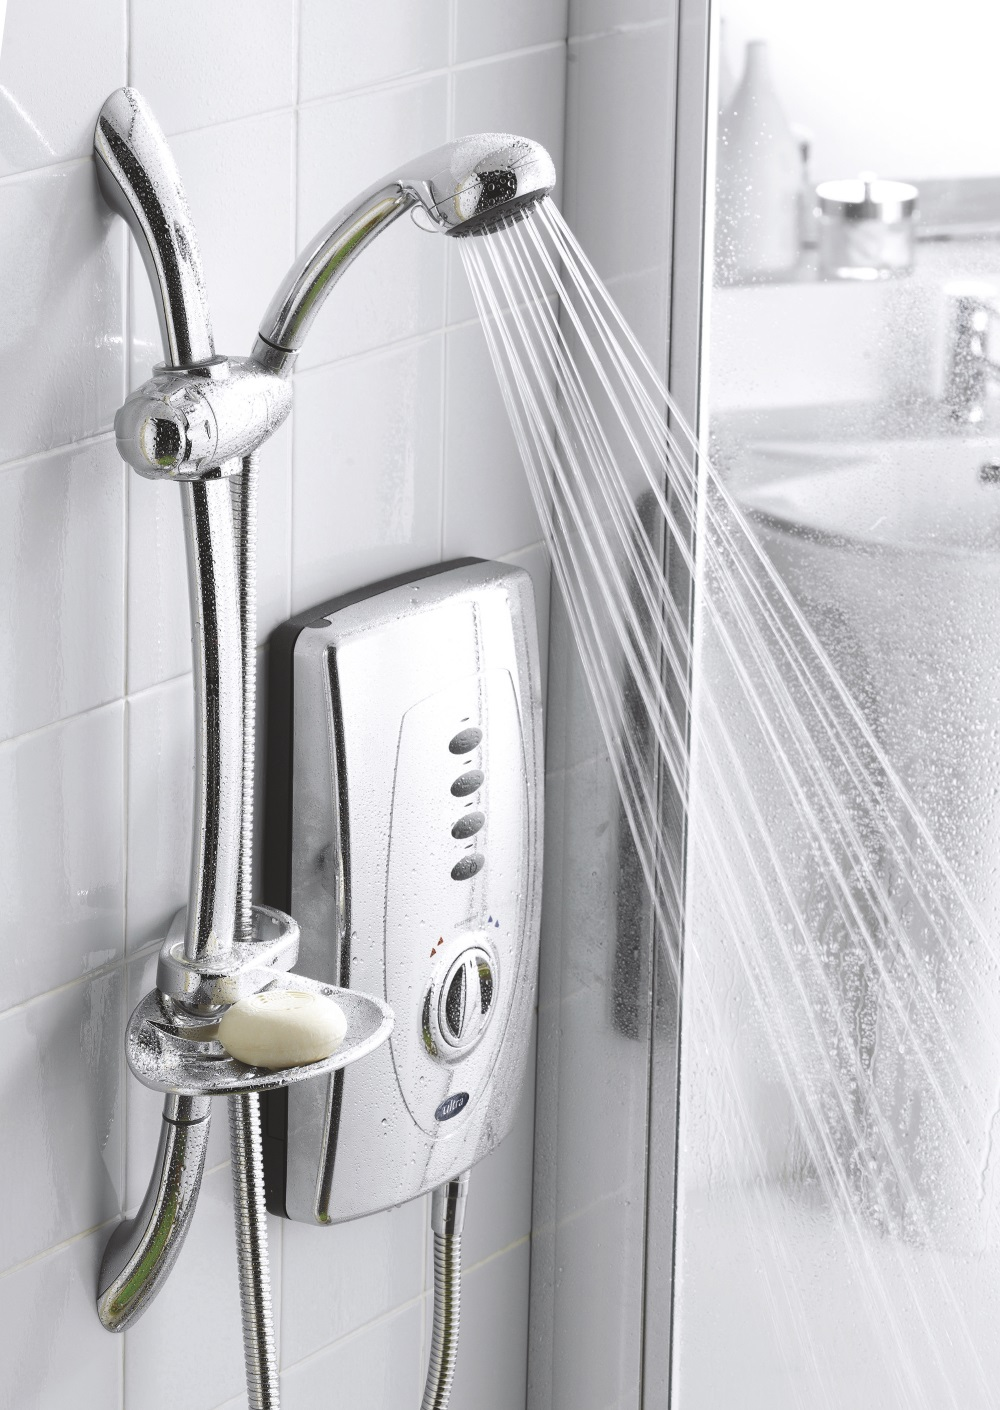 Showers Express Plumbing Supplies